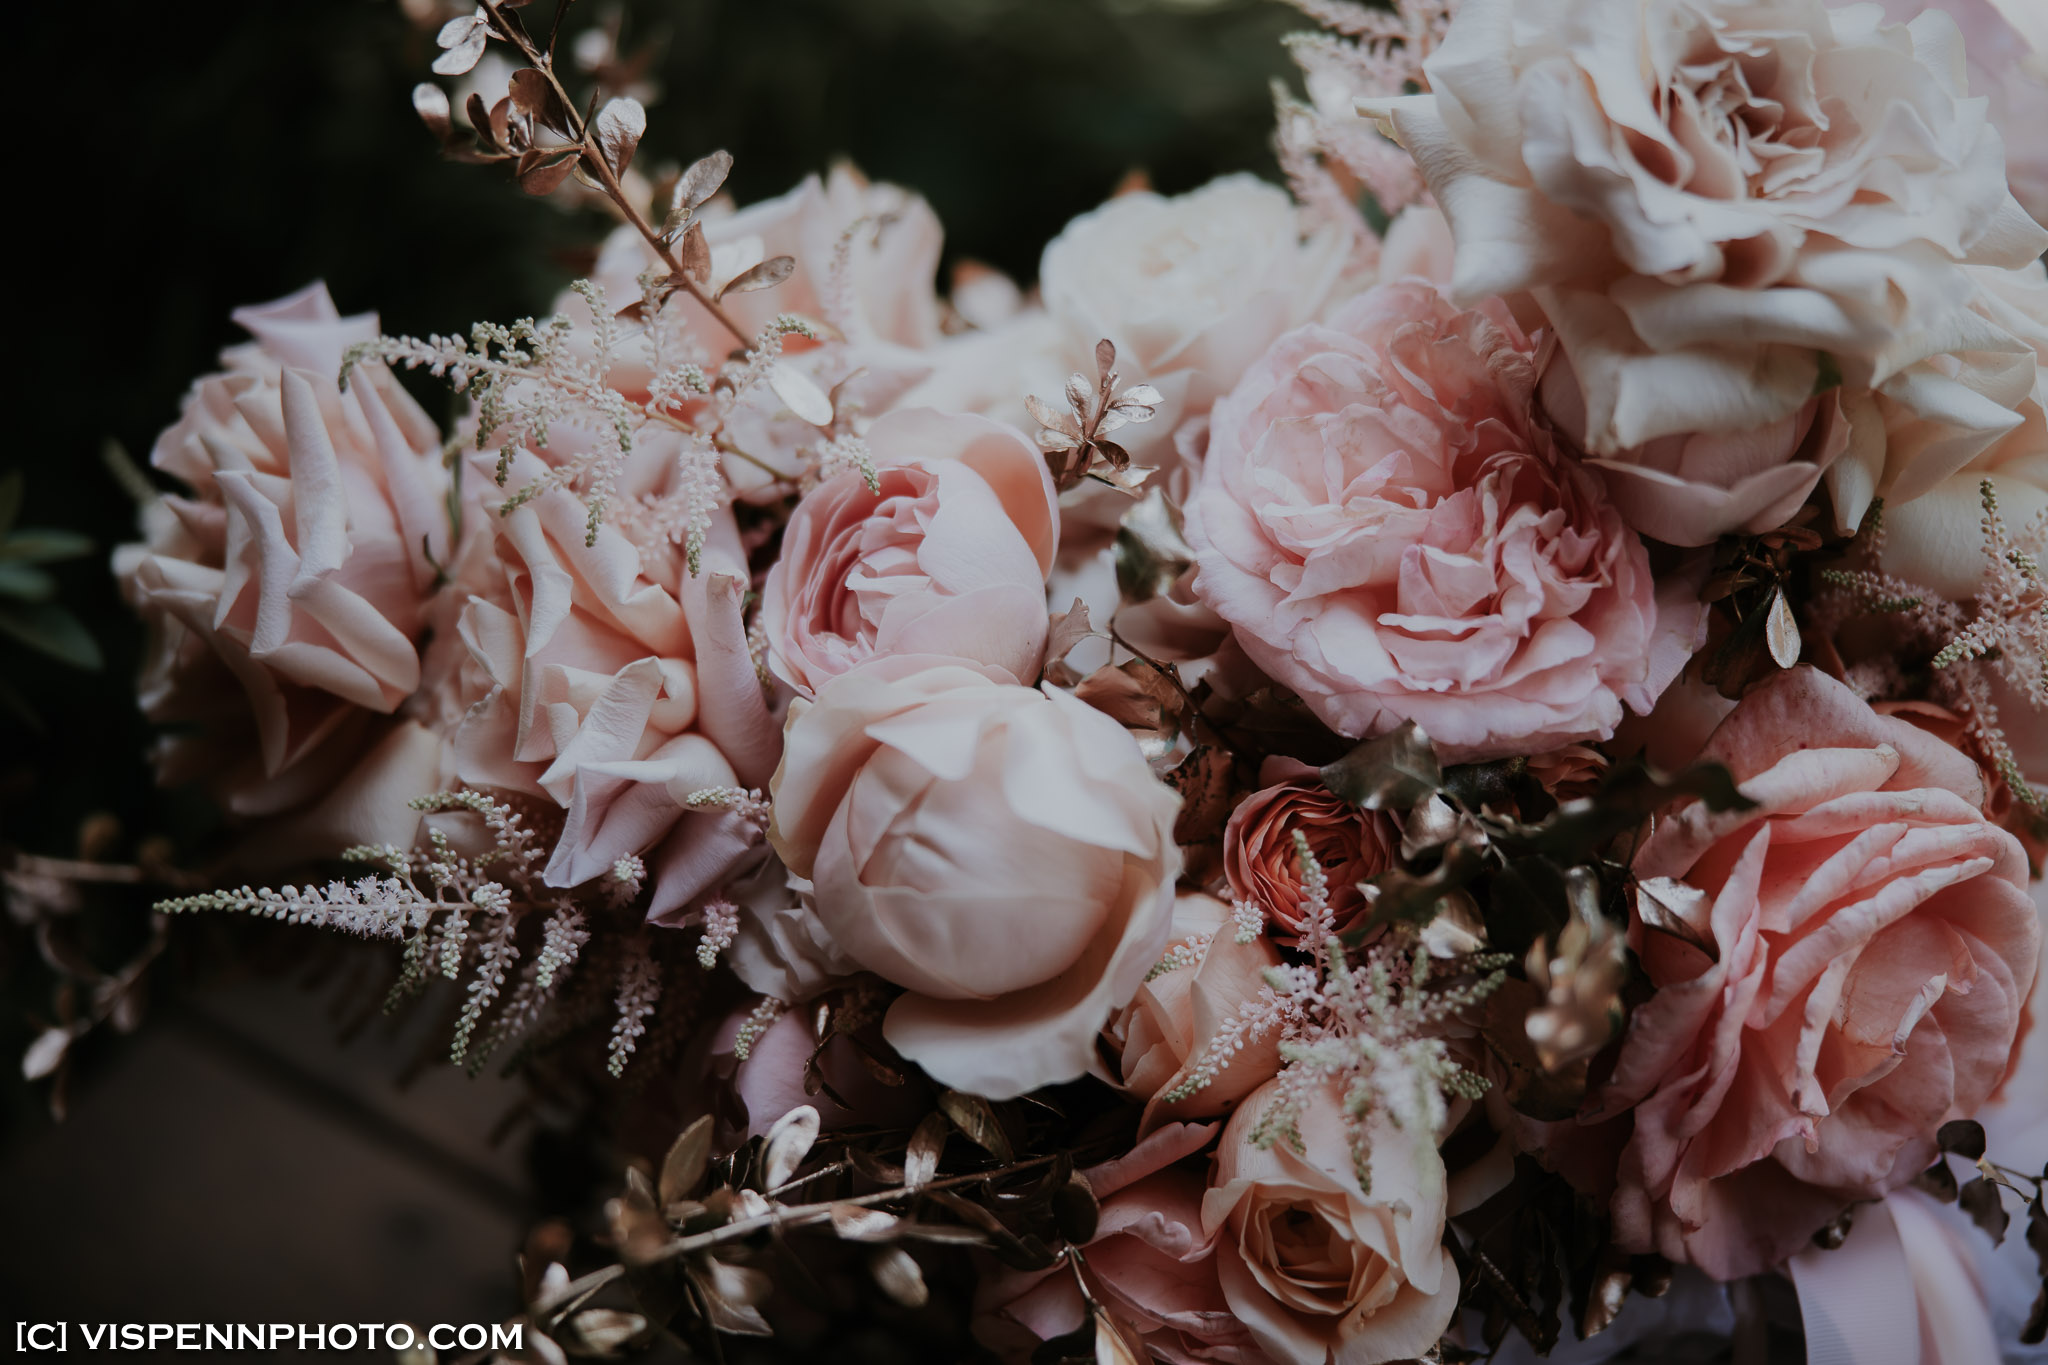 WEDDING DAY Photography Melbourne ElitaPB 03923 1P EOSR ZHPENN